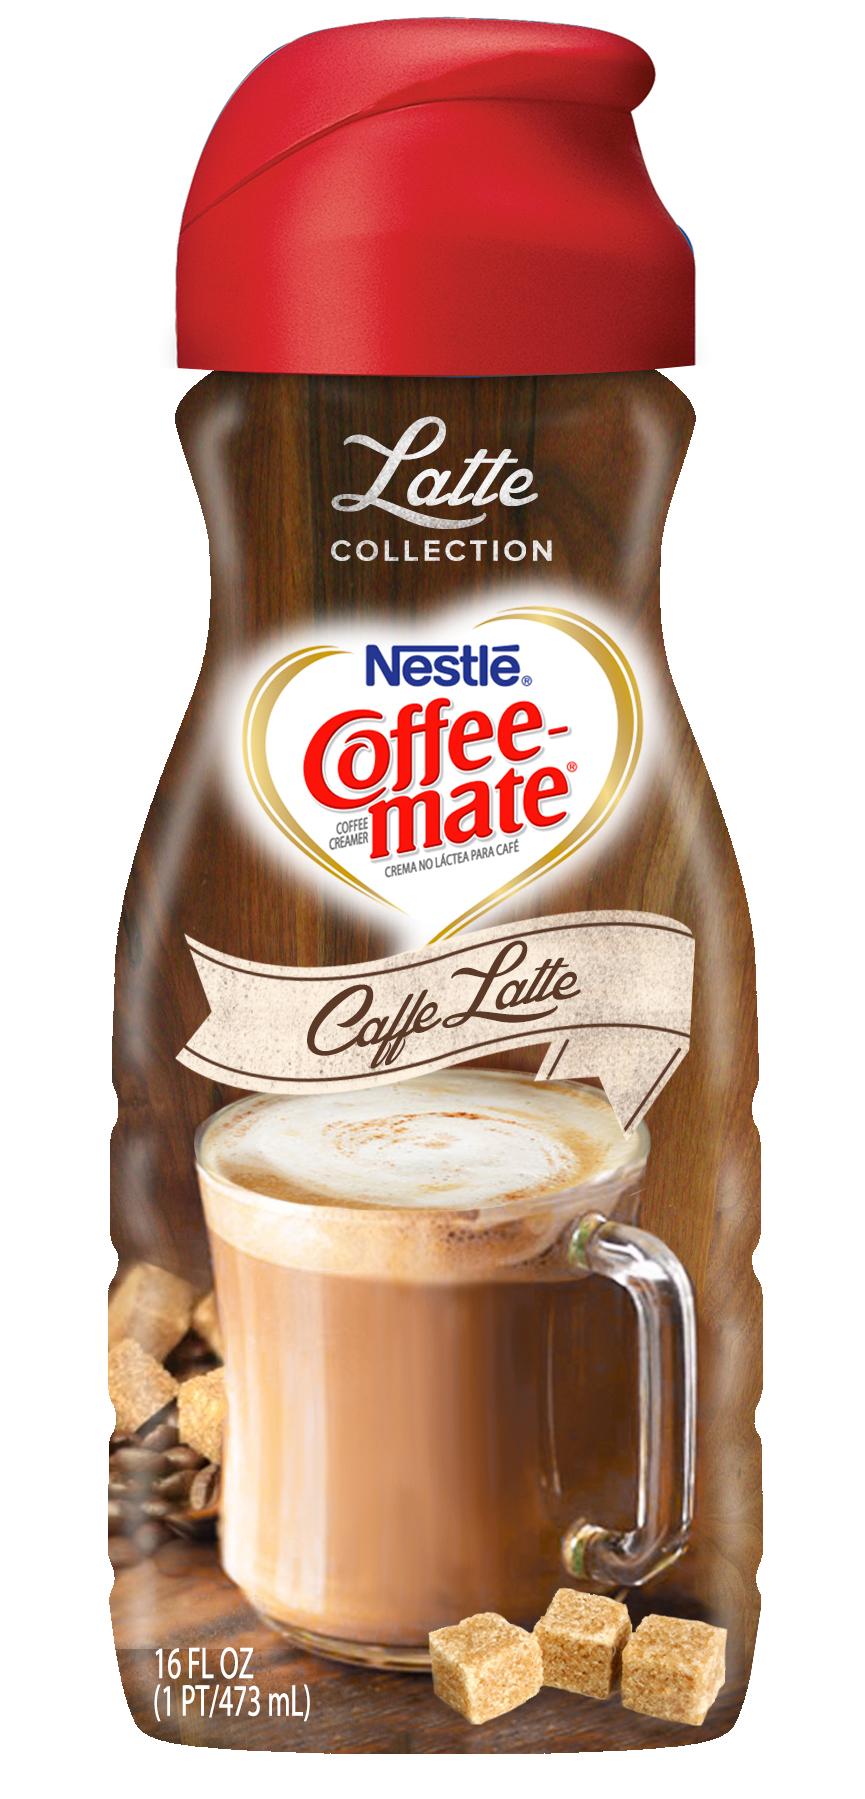 NES_CM_LatteCollection_CaffeLatte.jpg